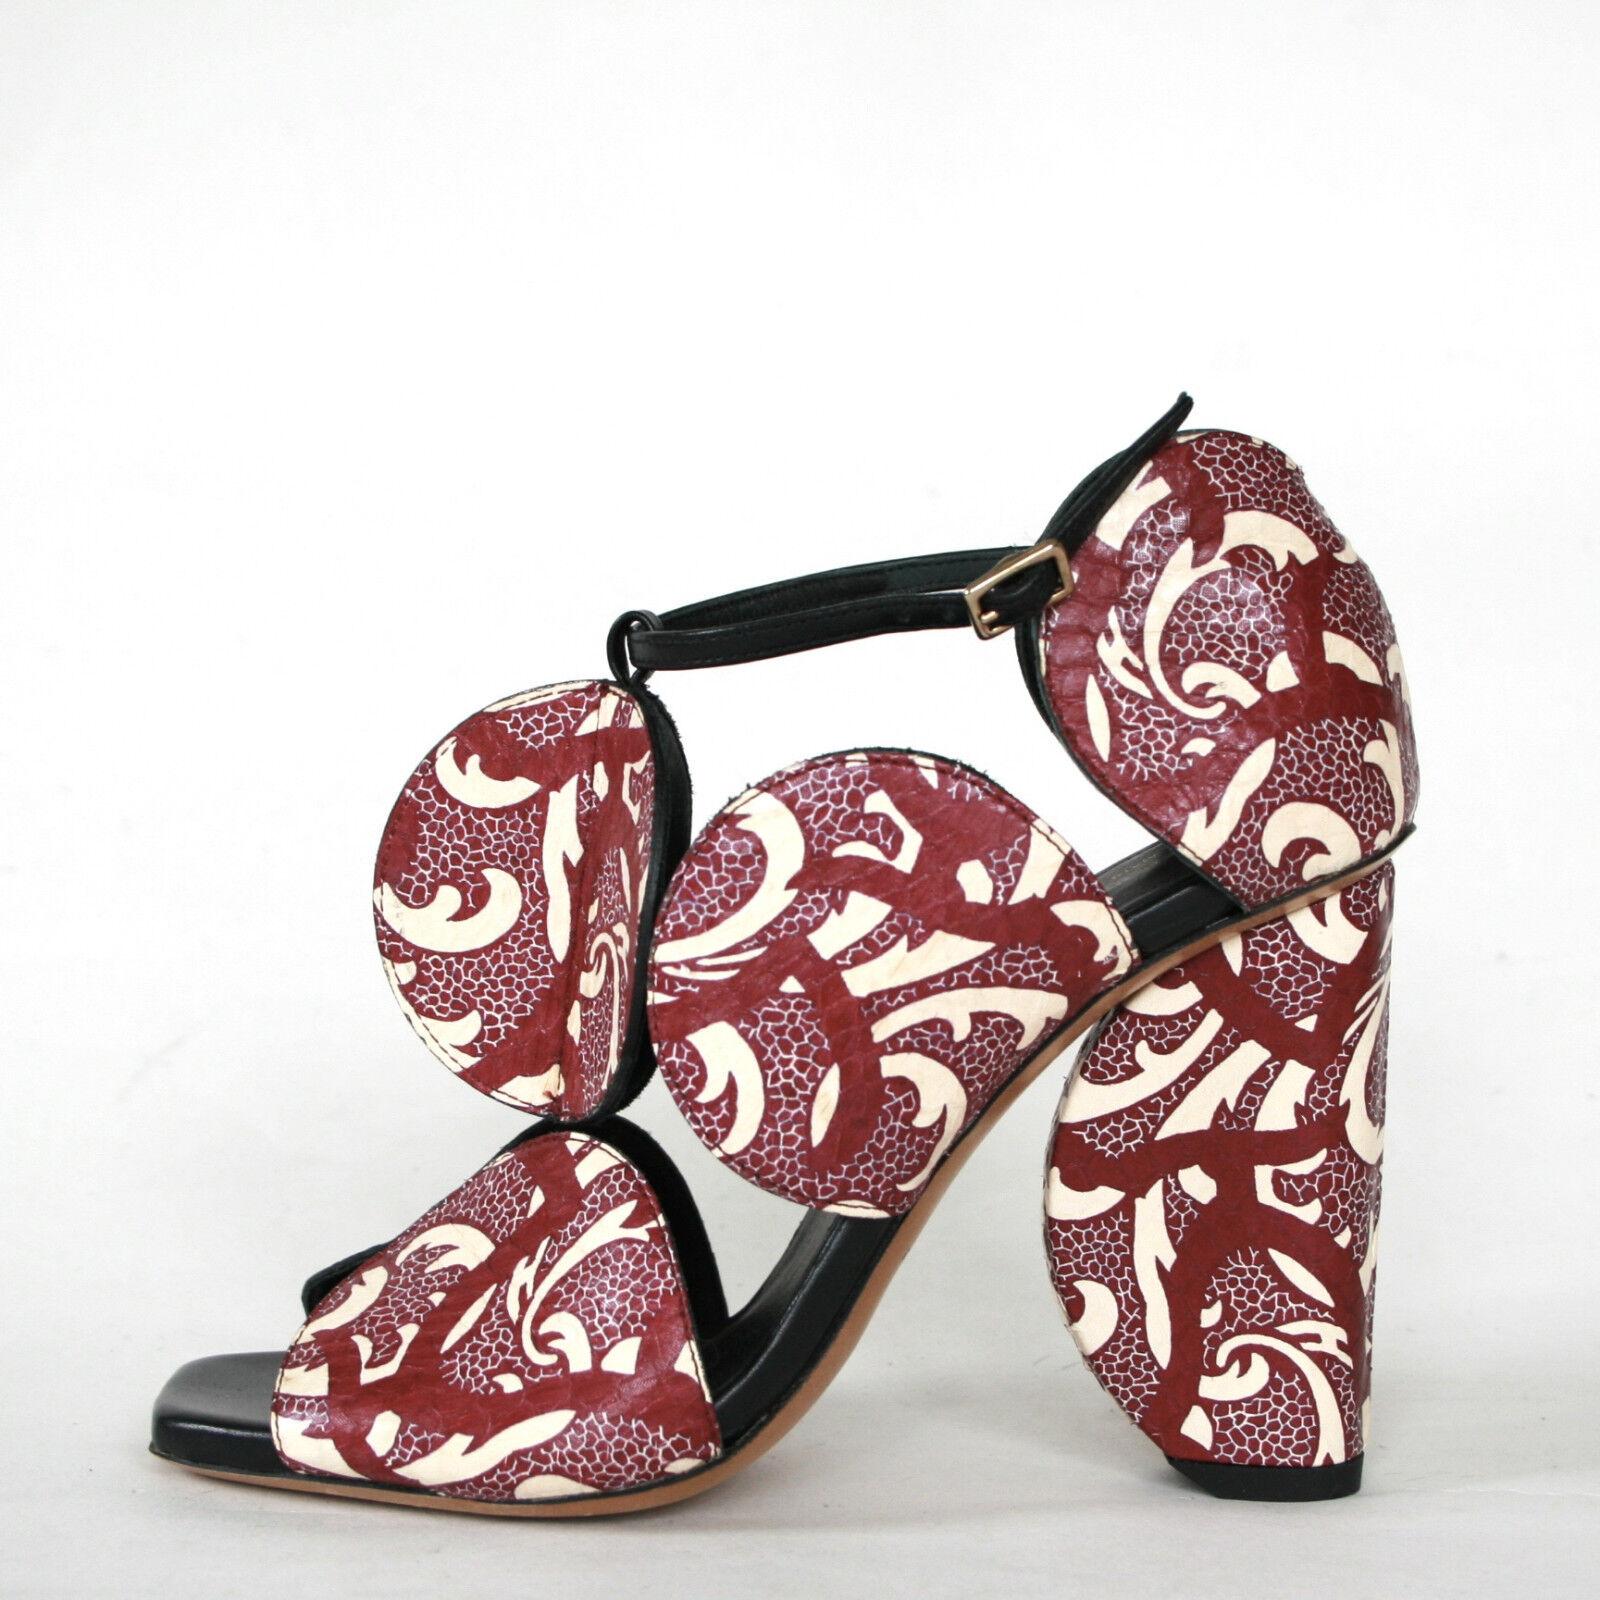 grande sconto DRIES VAN NOTEN circle circle circle cut high heel rosso pattern sandal square toed scarpe 35 NEW  marchi di moda